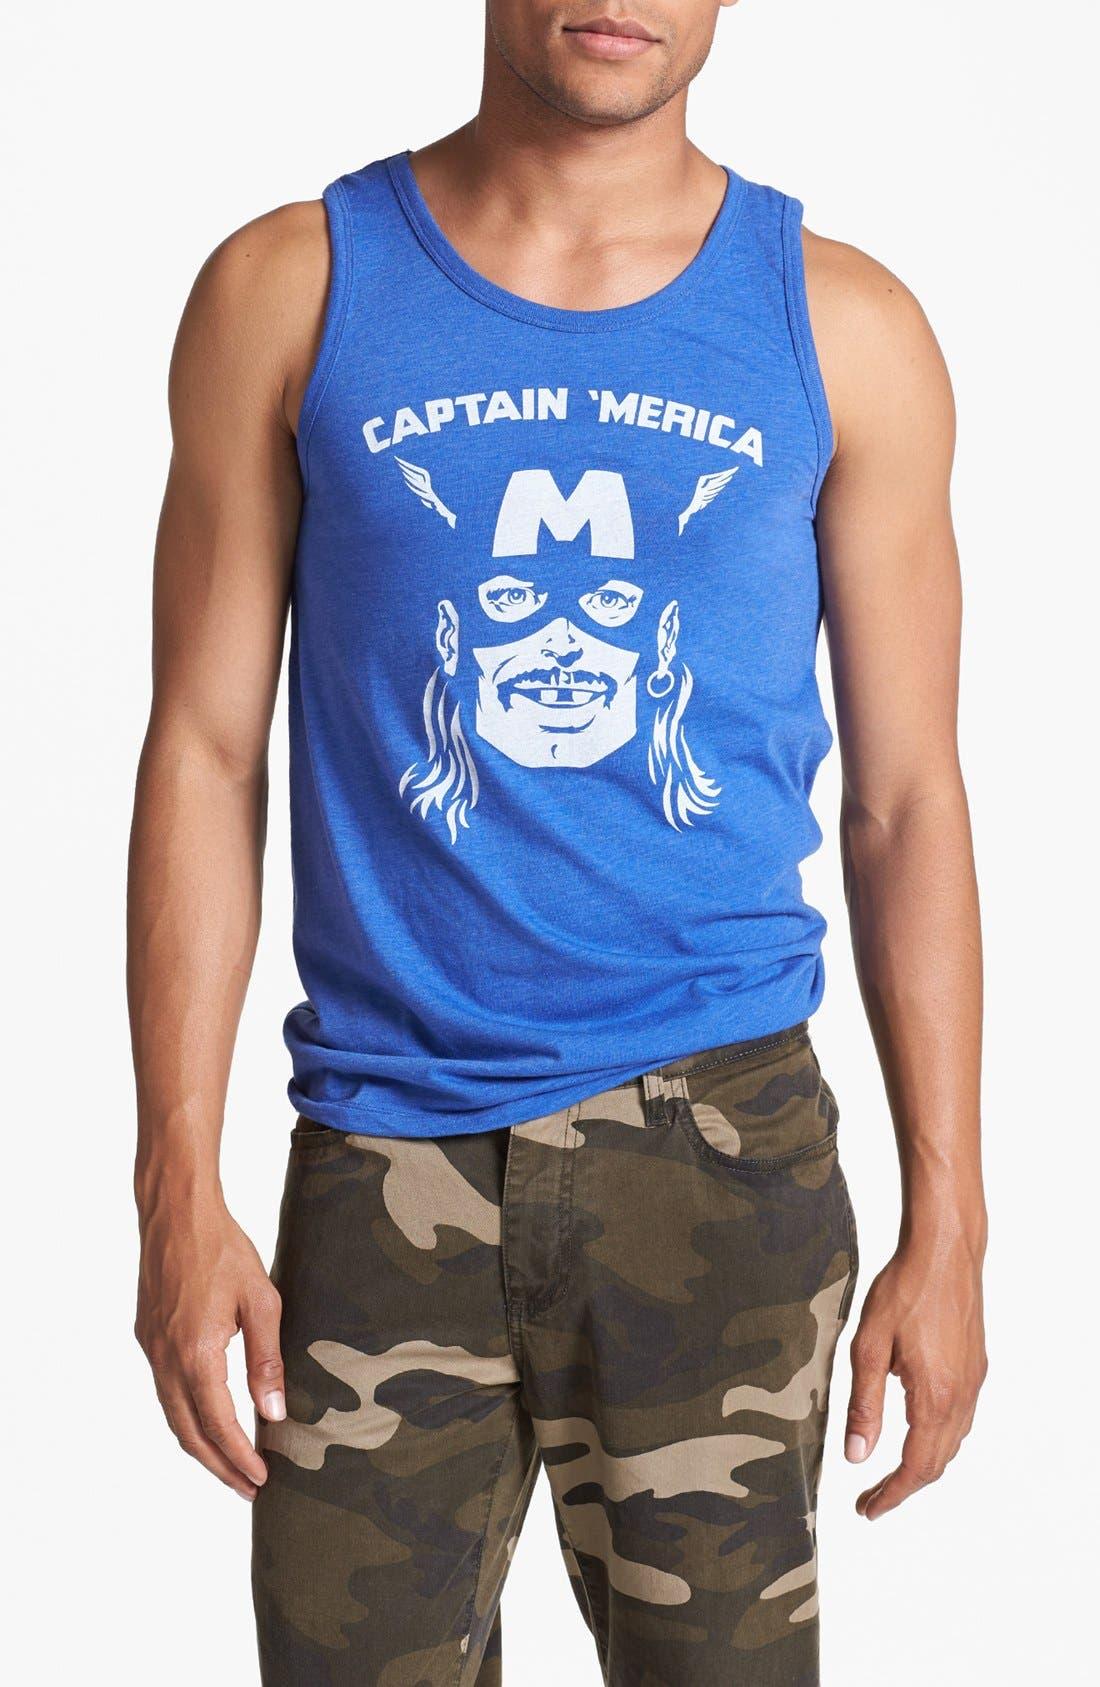 Main Image - Headline Shirt 'Captain Merica' Tank Top